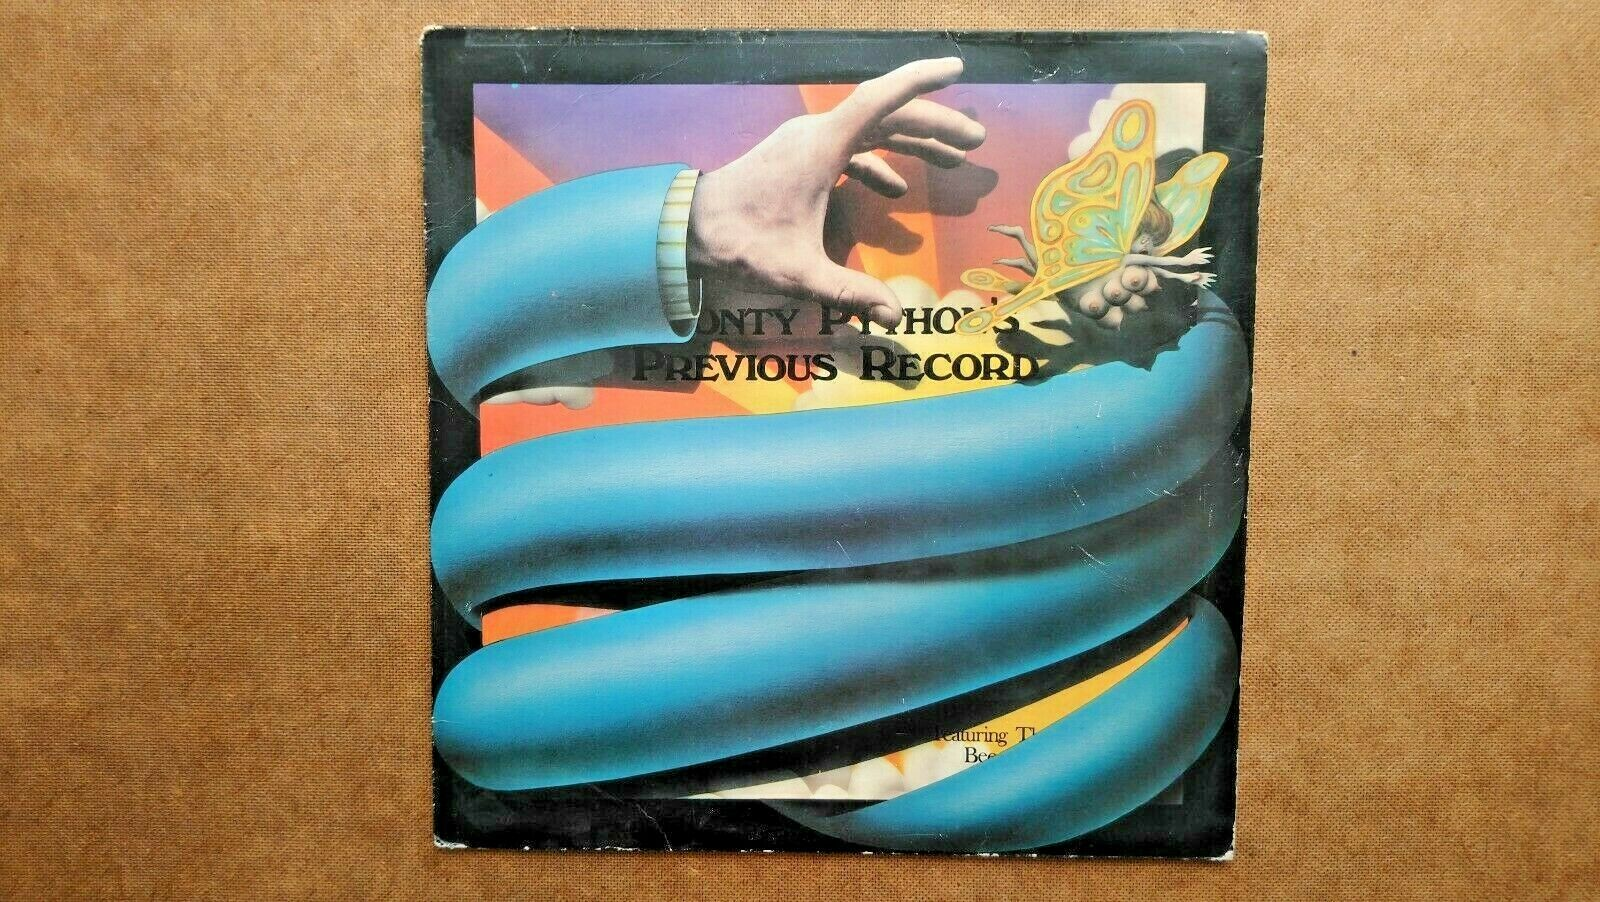 Monty Python's Previous Vinyl LP Record  (1972)